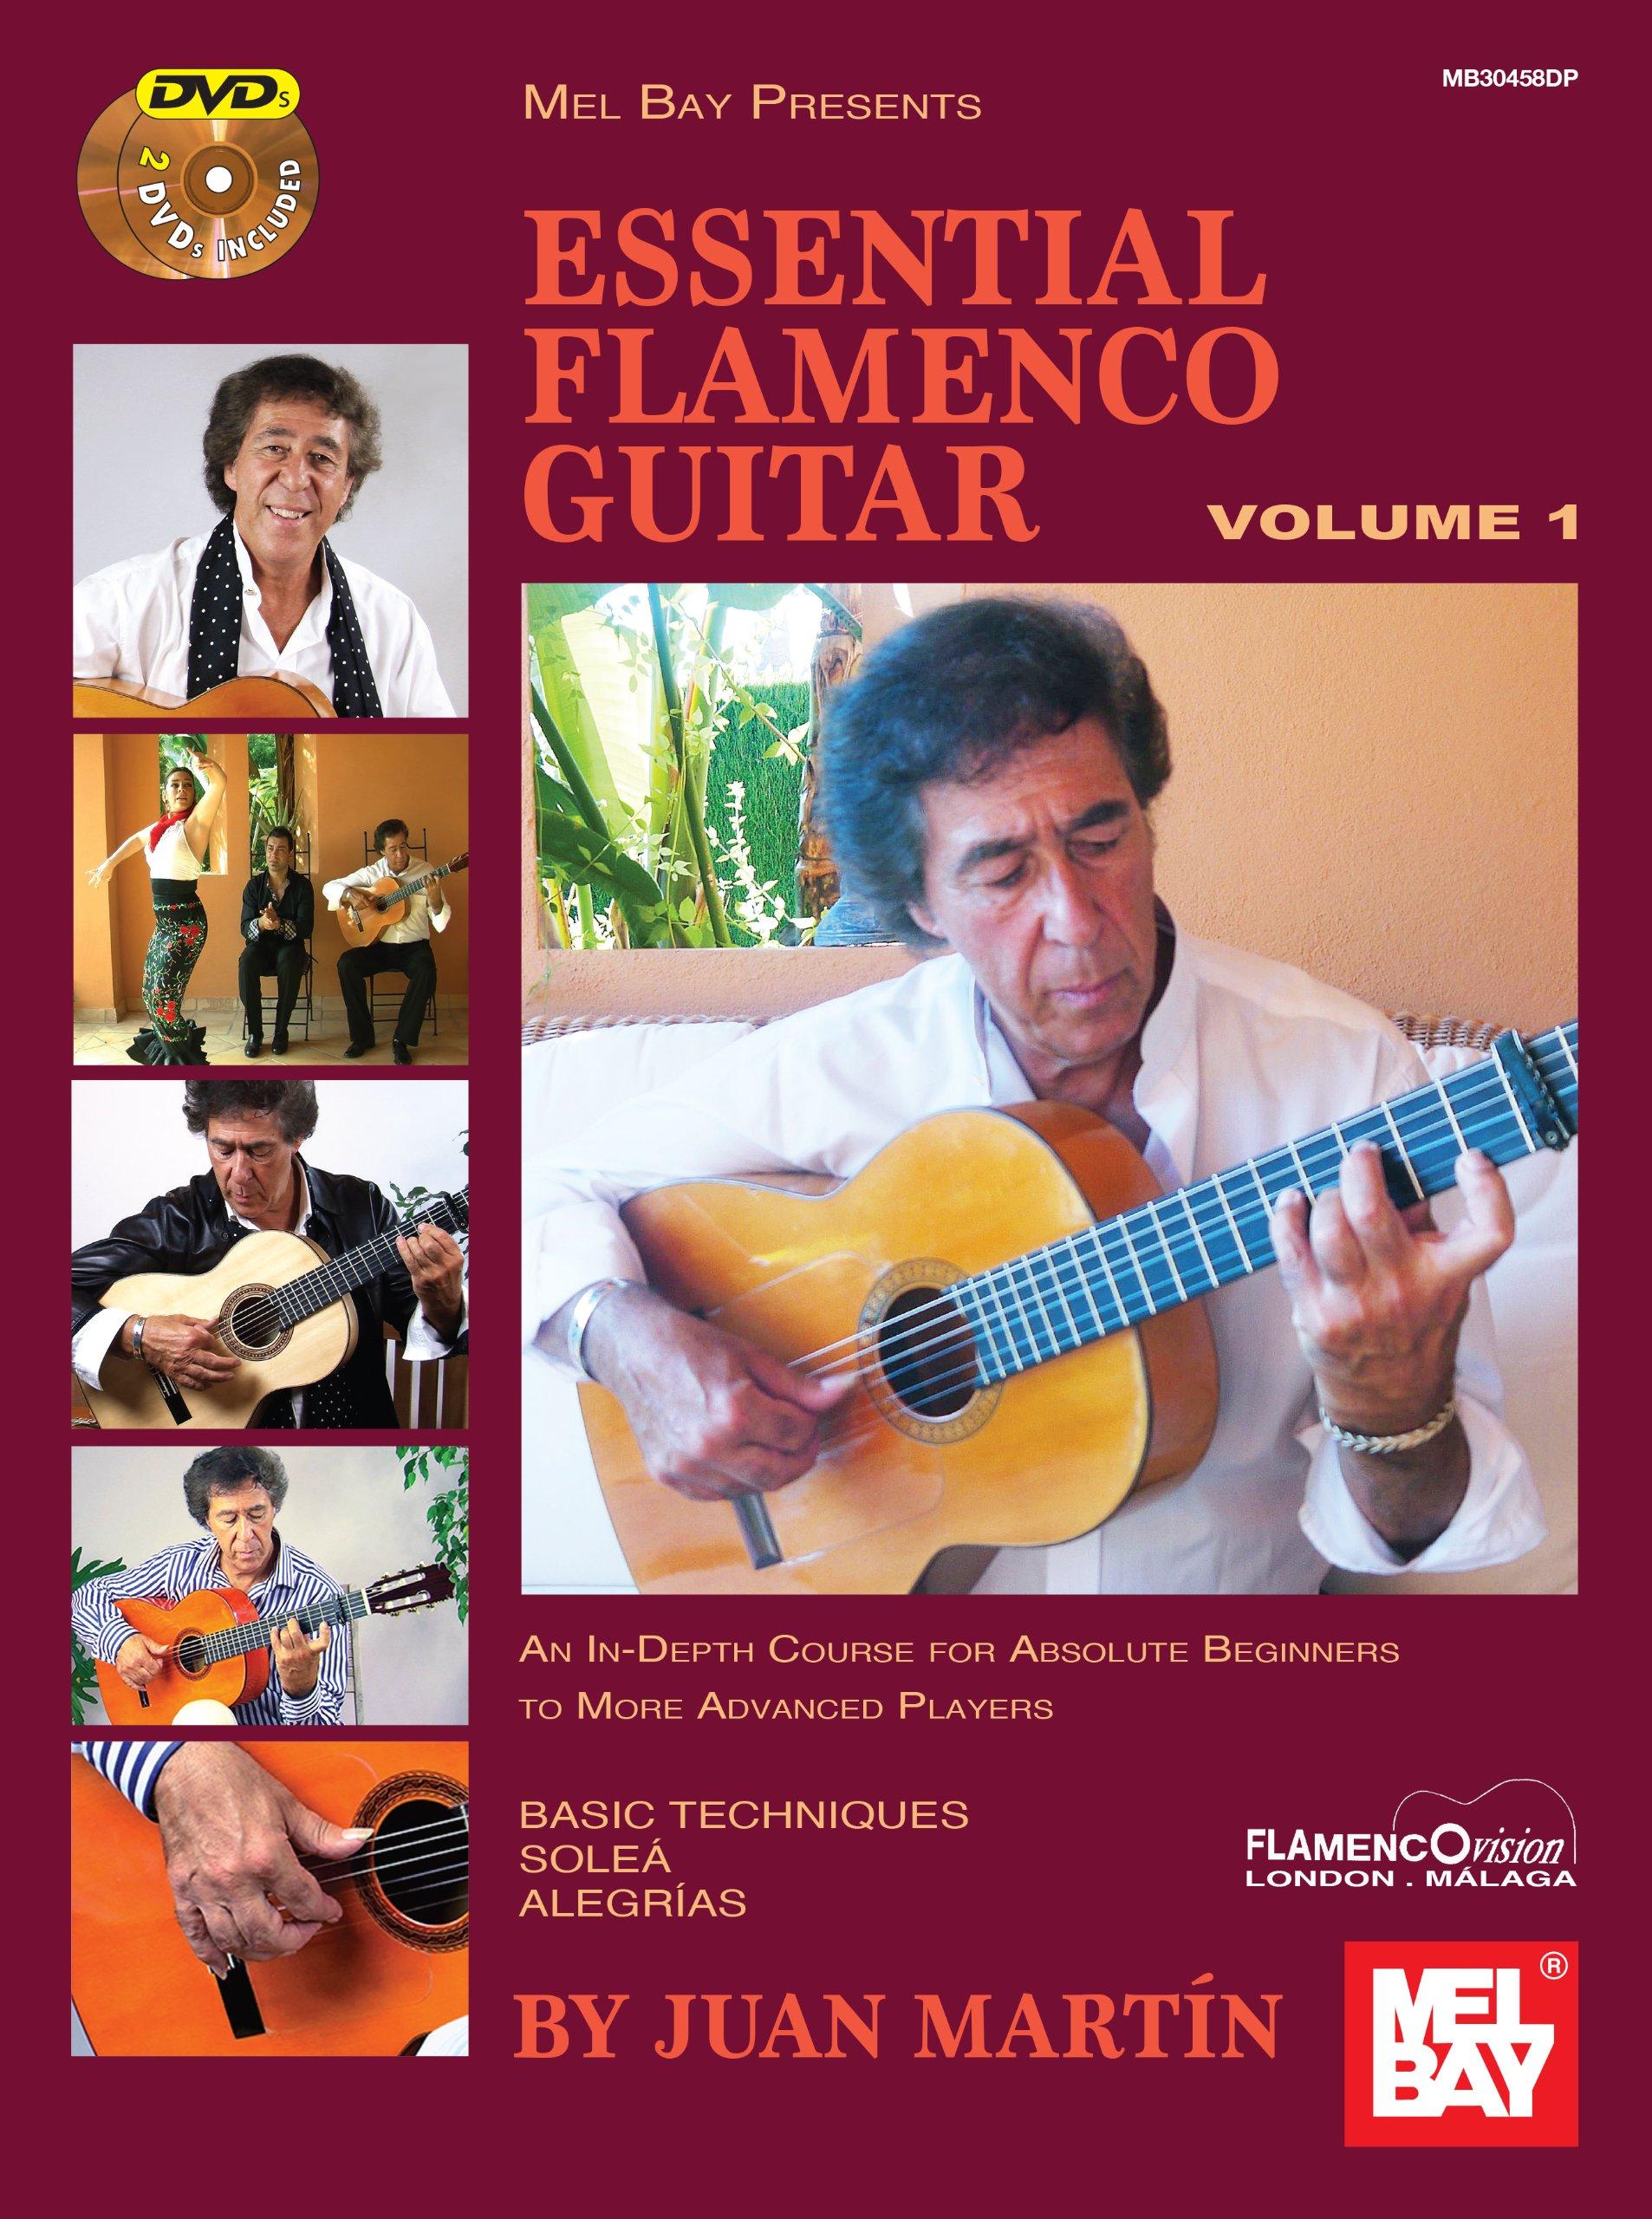 Essential Flamenco Guitar: Volume 1 by Mel Bay Publications Inc